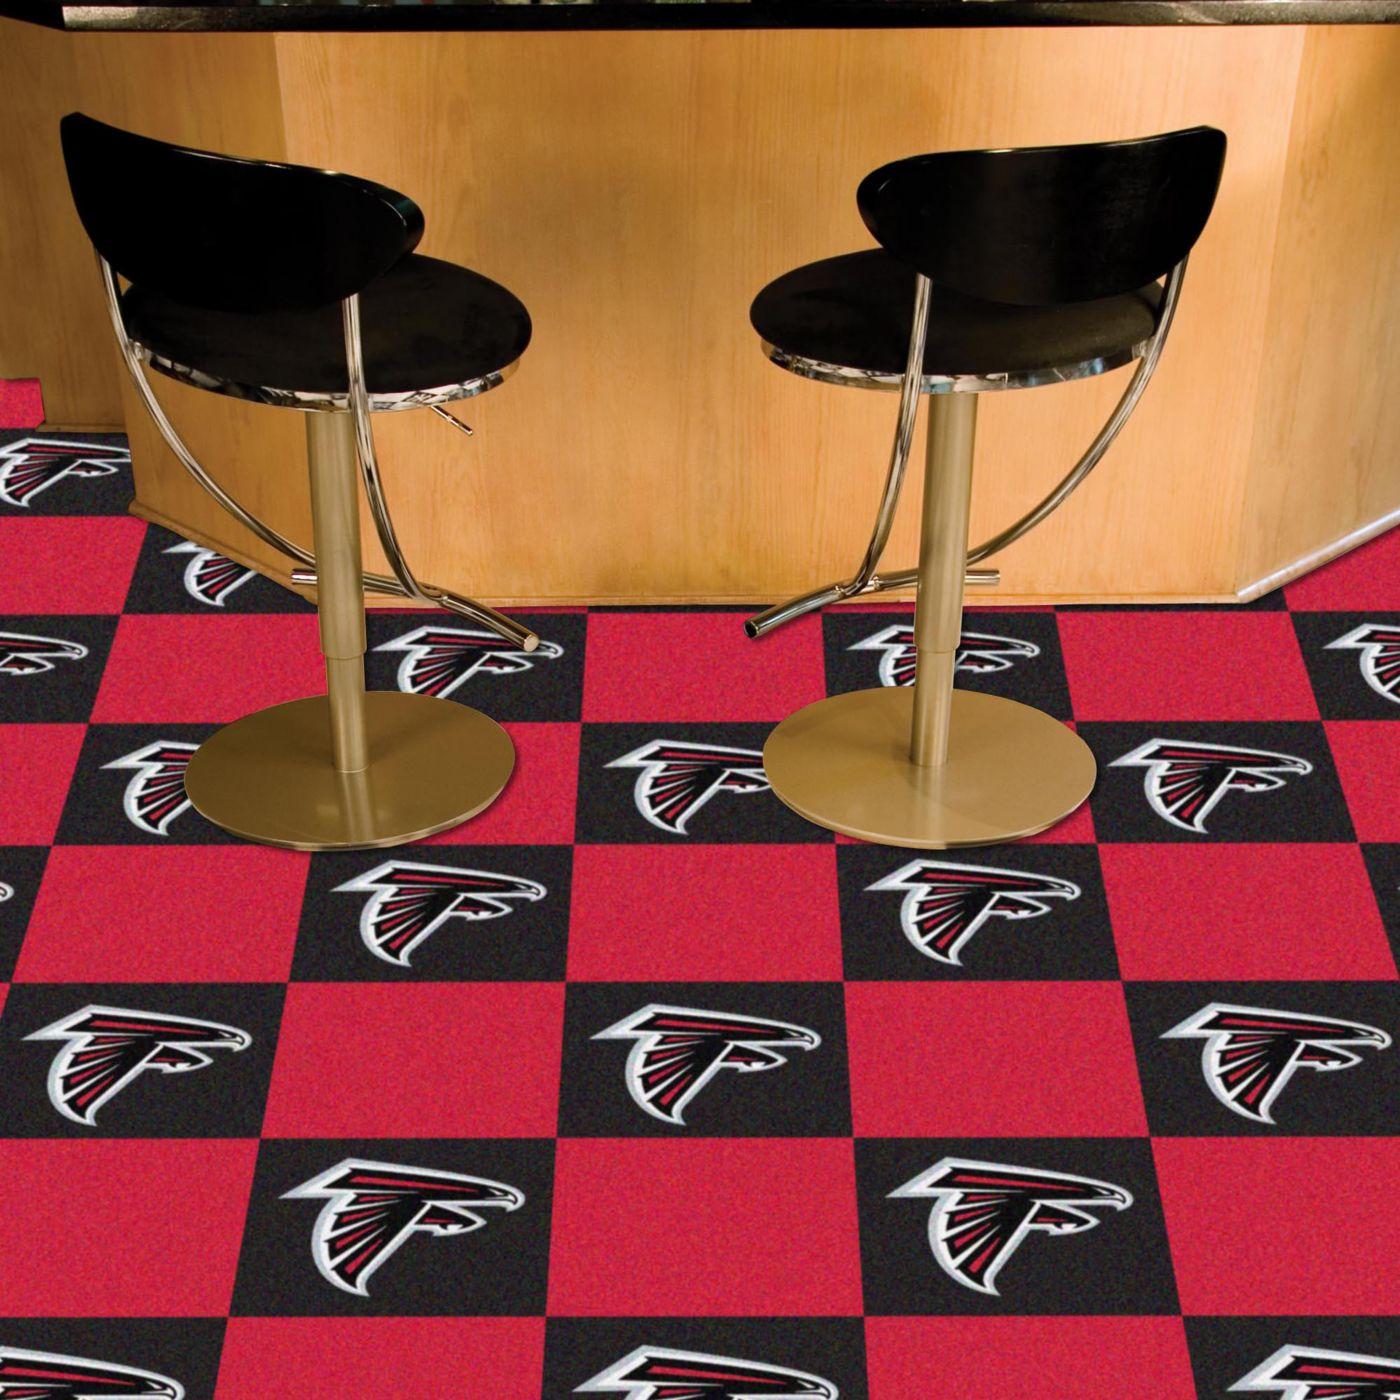 FANMATS Atlanta Falcons Team Carpet Tiles